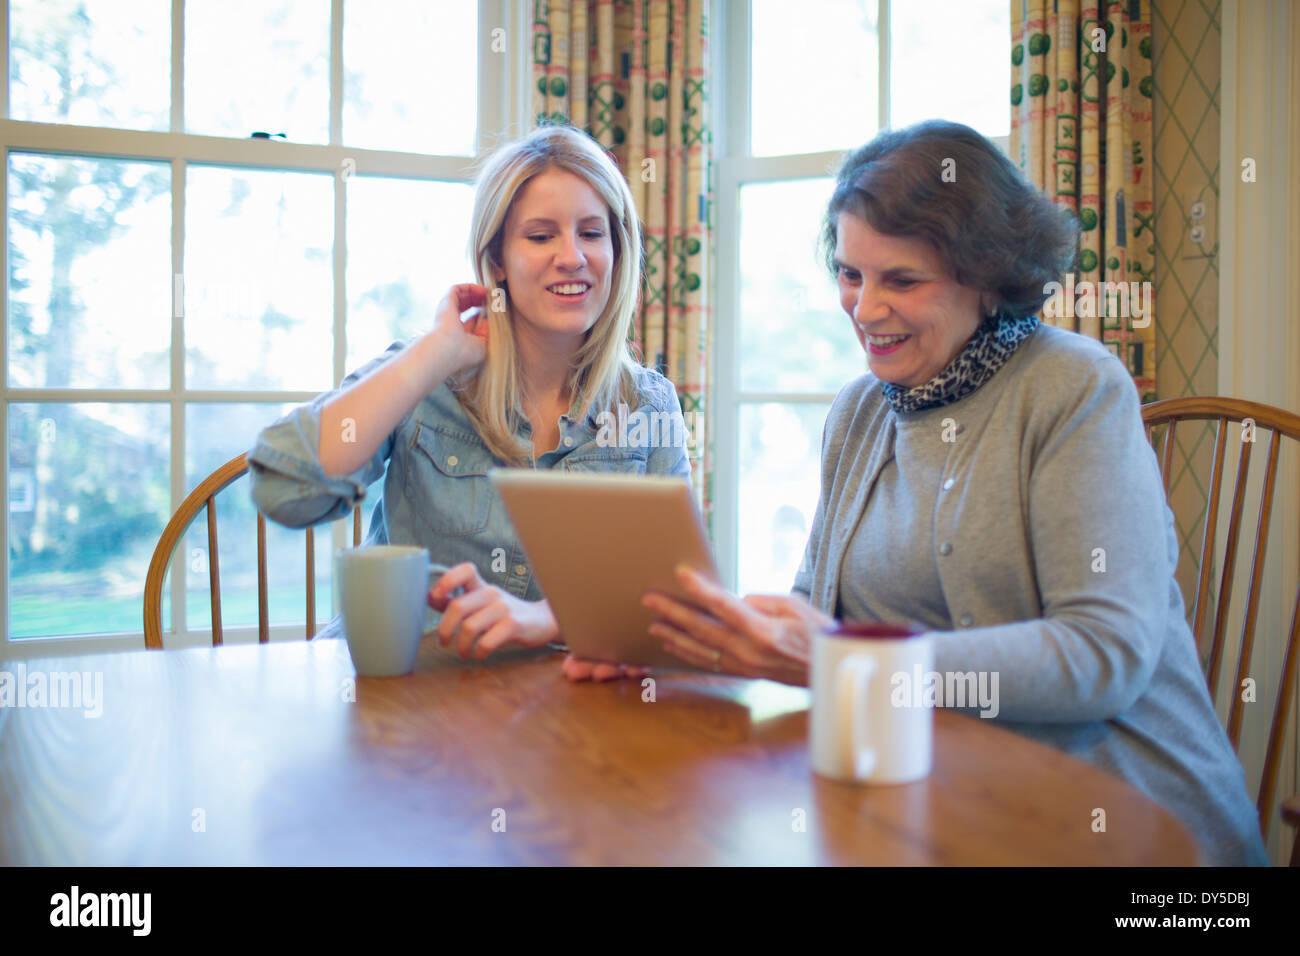 Senior woman and granddaughter looking at digital tablet - Stock Image